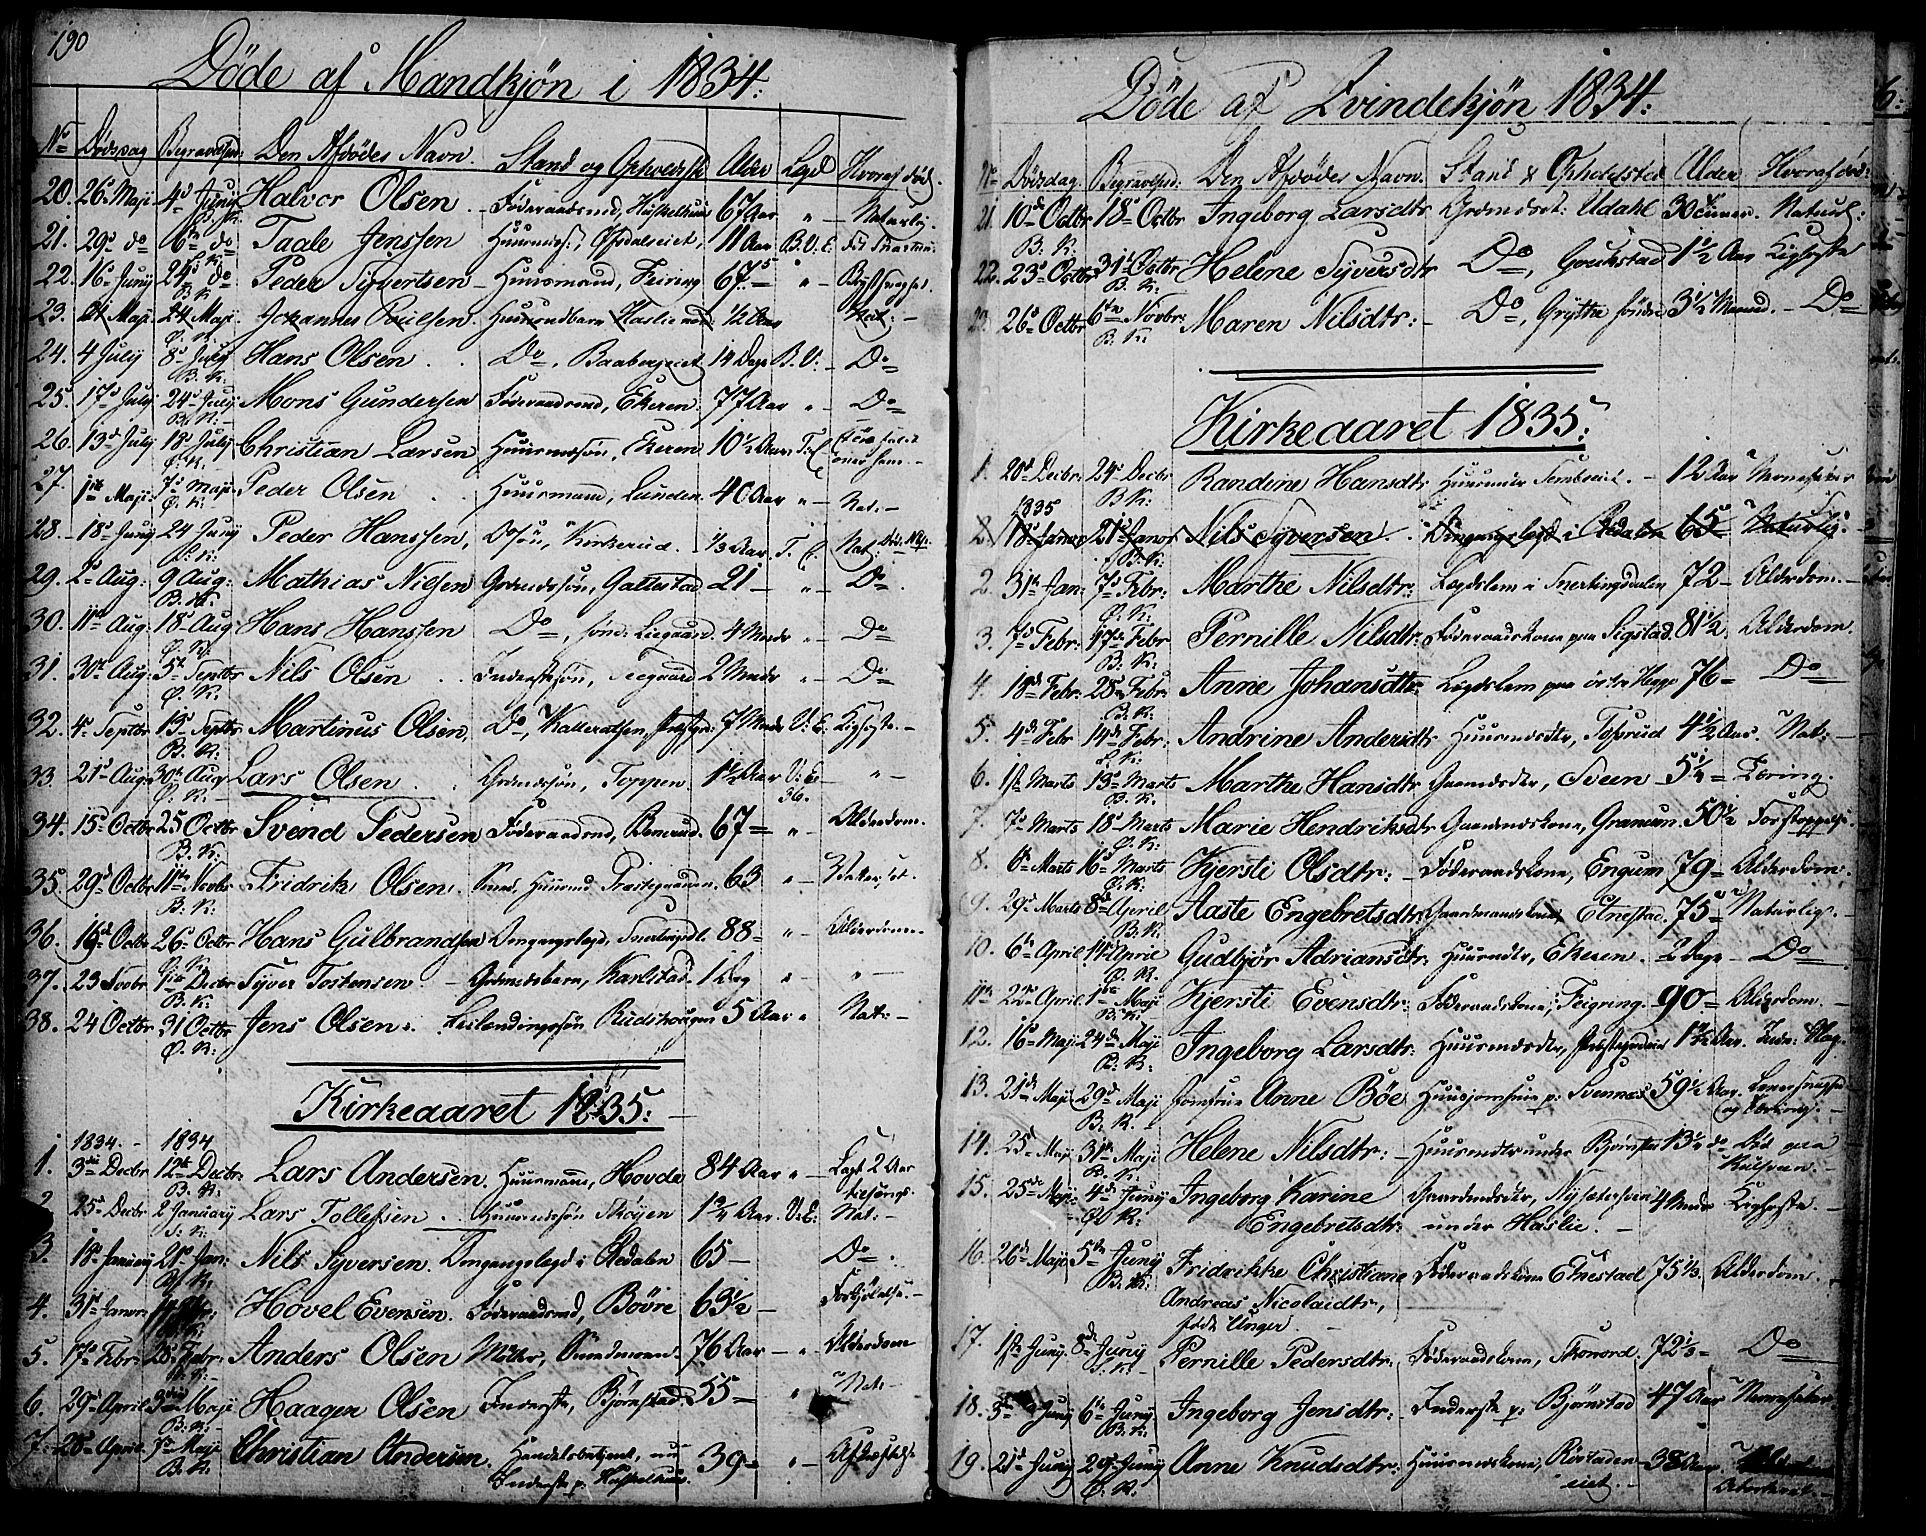 SAH, Biri prestekontor, Ministerialbok nr. 4, 1829-1842, s. 190